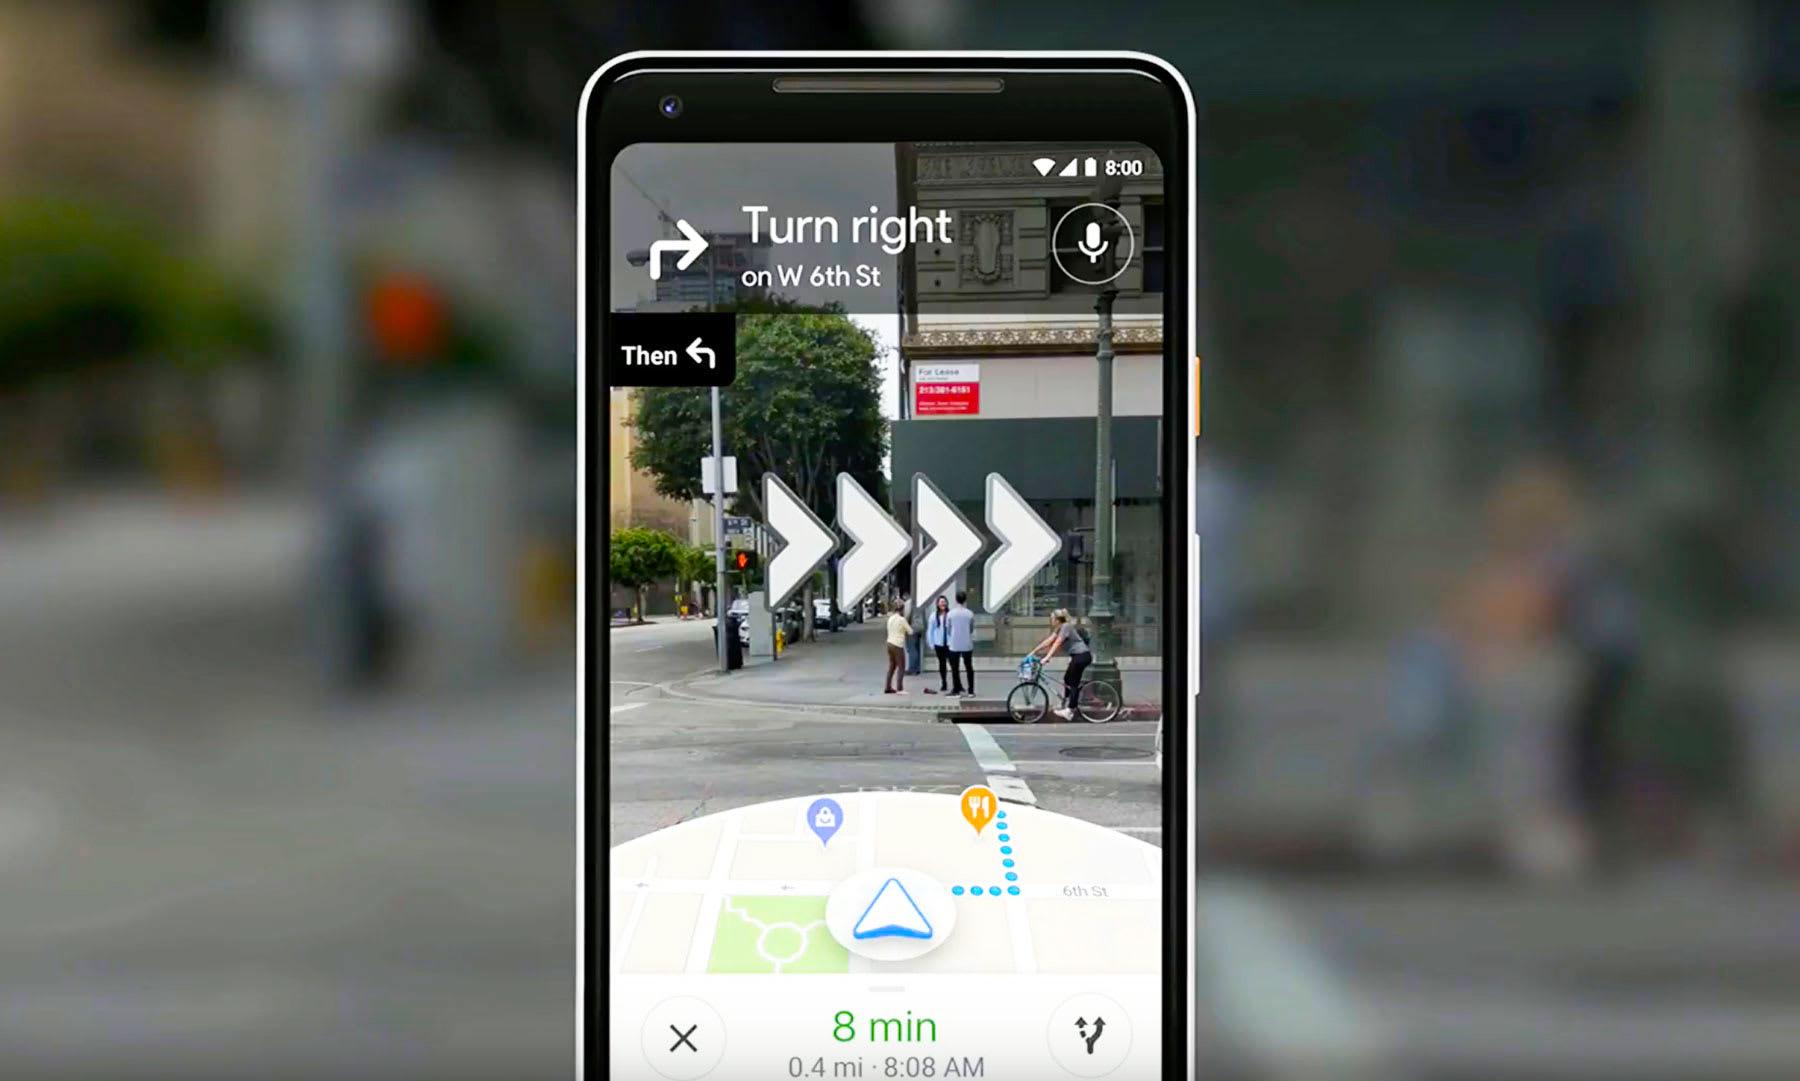 Google shows off its camera-enabled navigation system